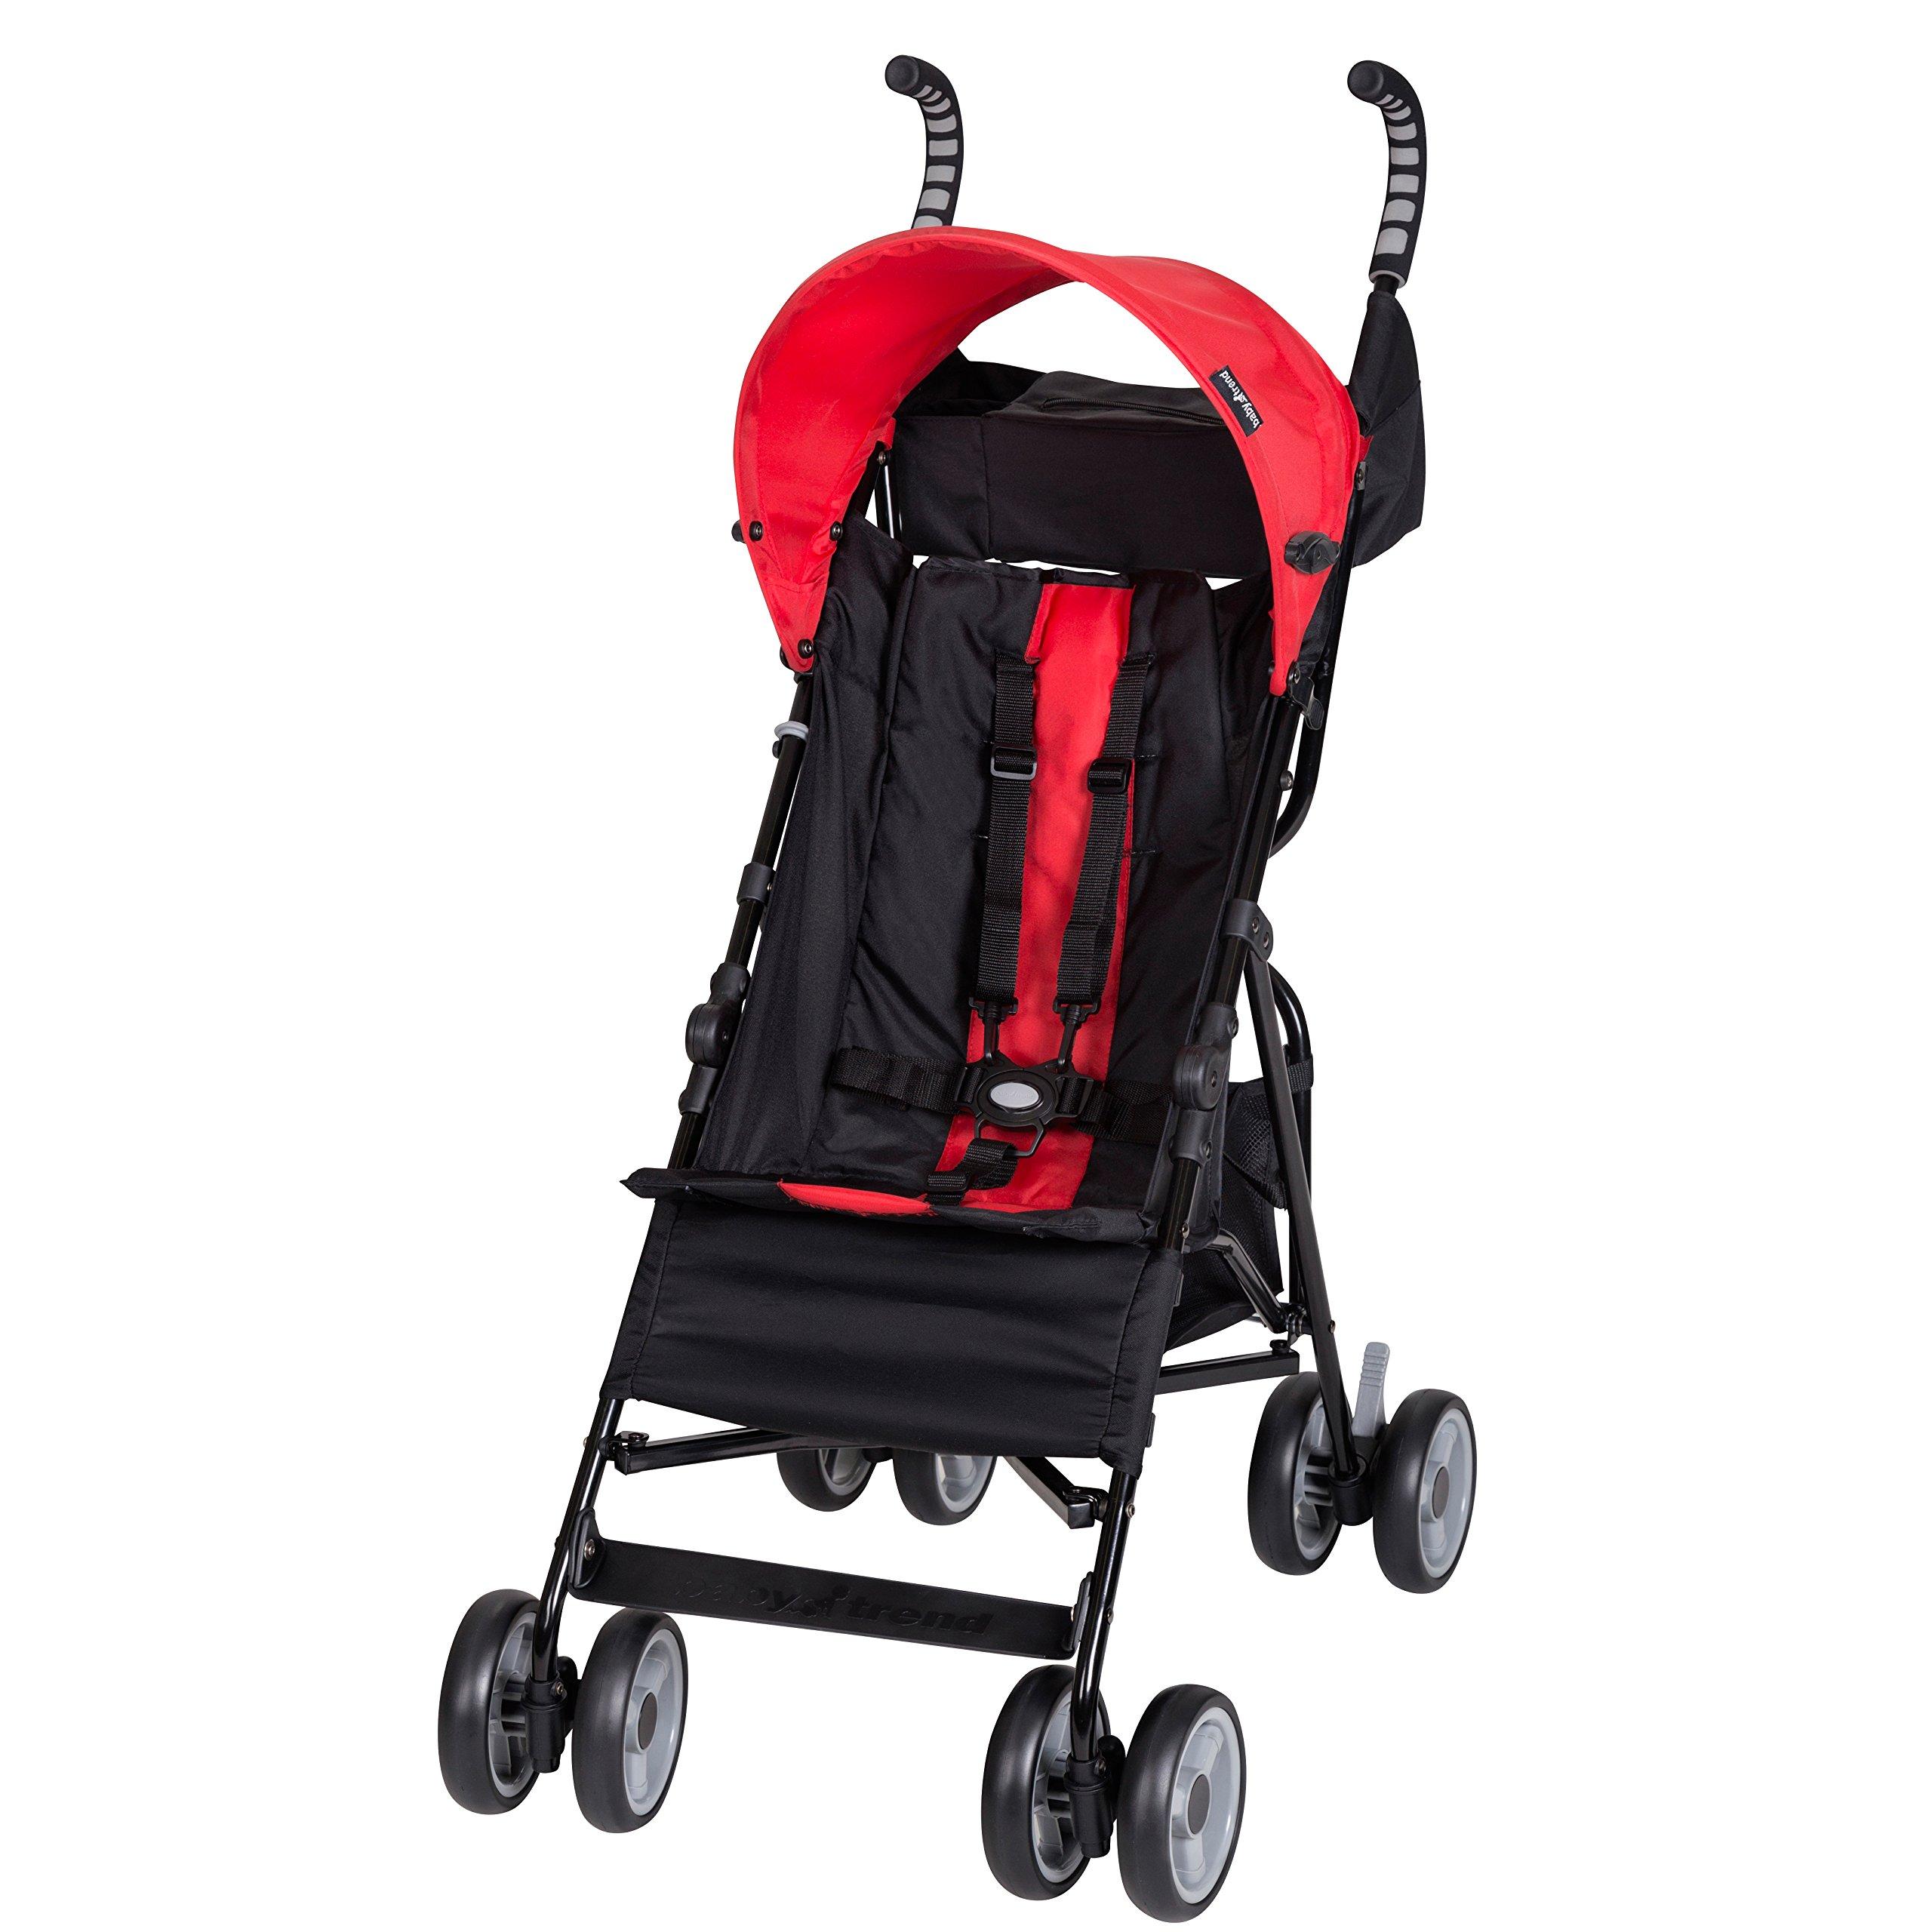 Baby Trend Rocket Lightweight Stroller, Duke - Buy Online ...